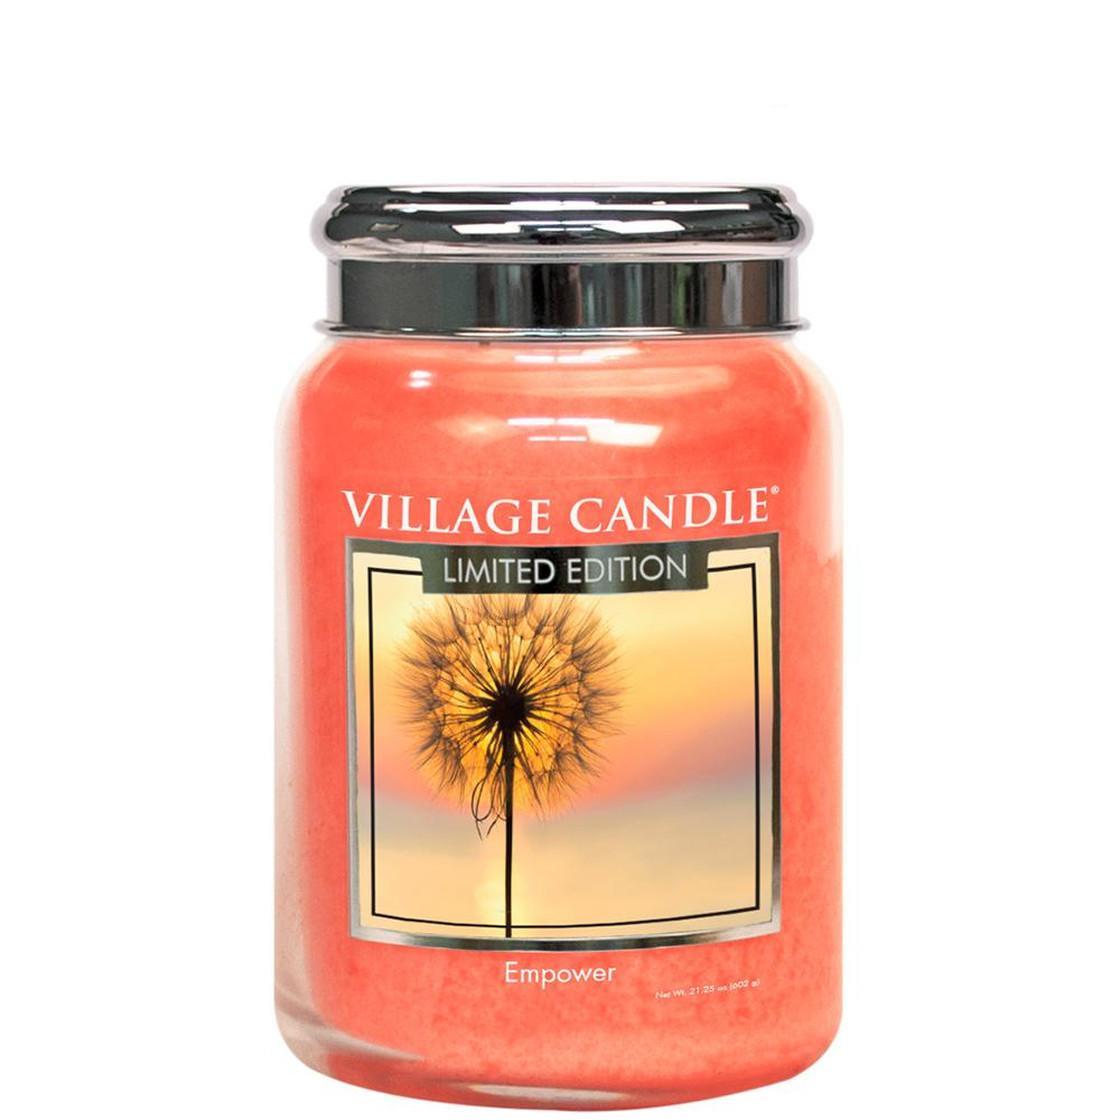 VILLAGE CANDLE Svíčka Village Candle - Empower 602g, oranžová barva, sklo, kov